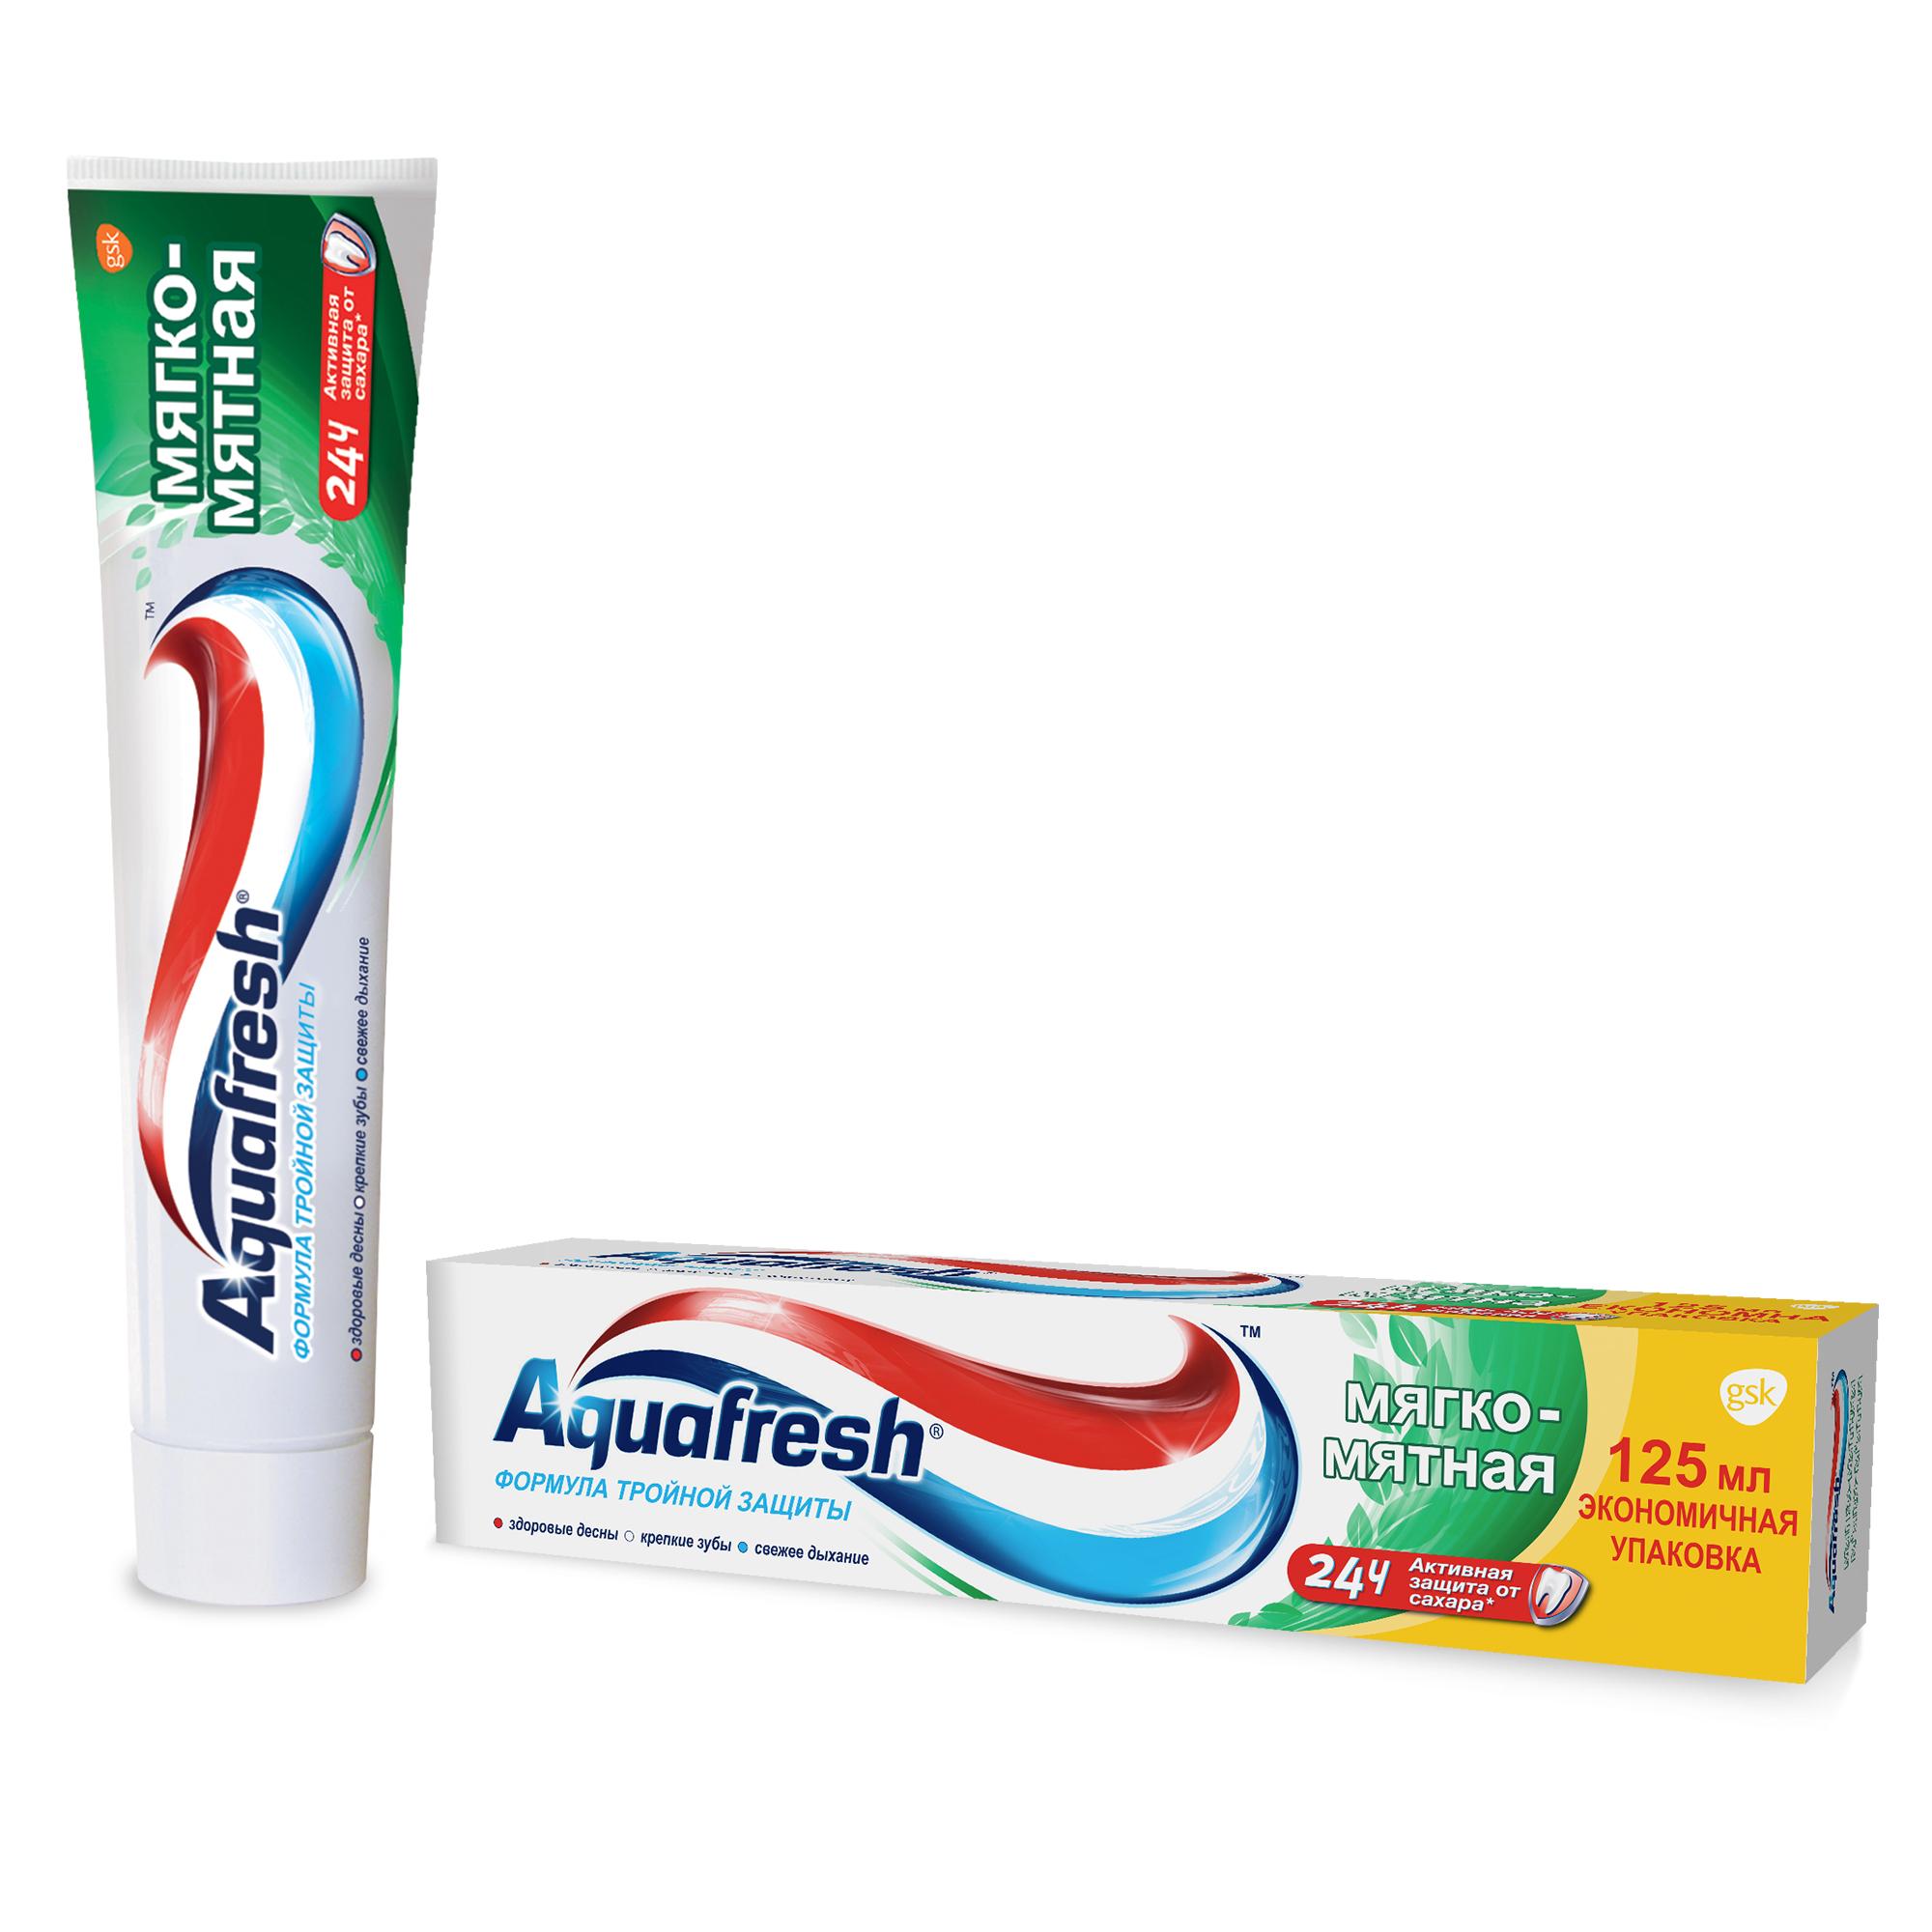 Зубная паста Aquafresh Тройная защита Мягко-мятная, 125 мл